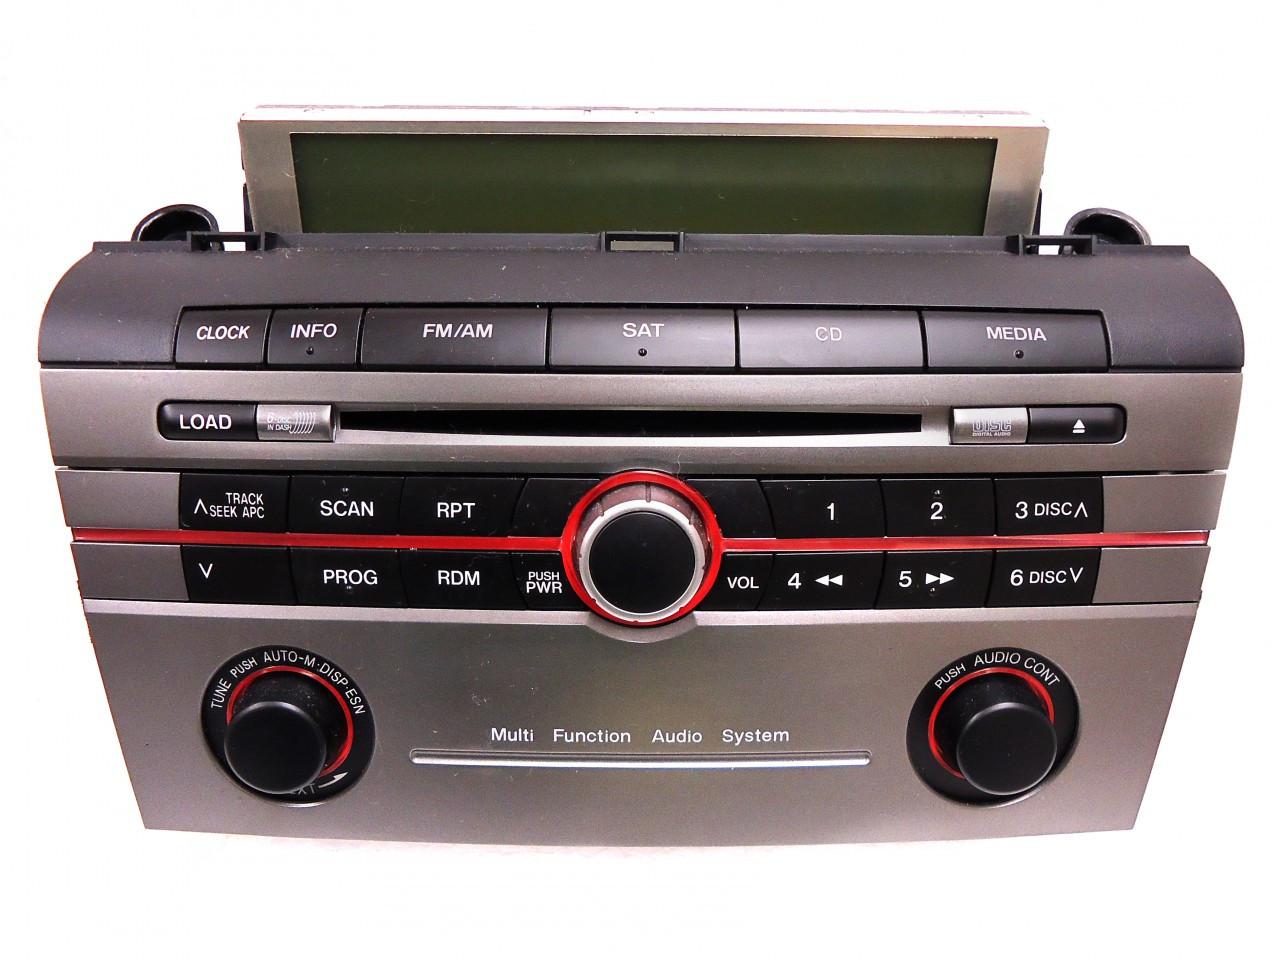 mazda 3 radio stereo 6 disc changer cd player sat multi. Black Bedroom Furniture Sets. Home Design Ideas